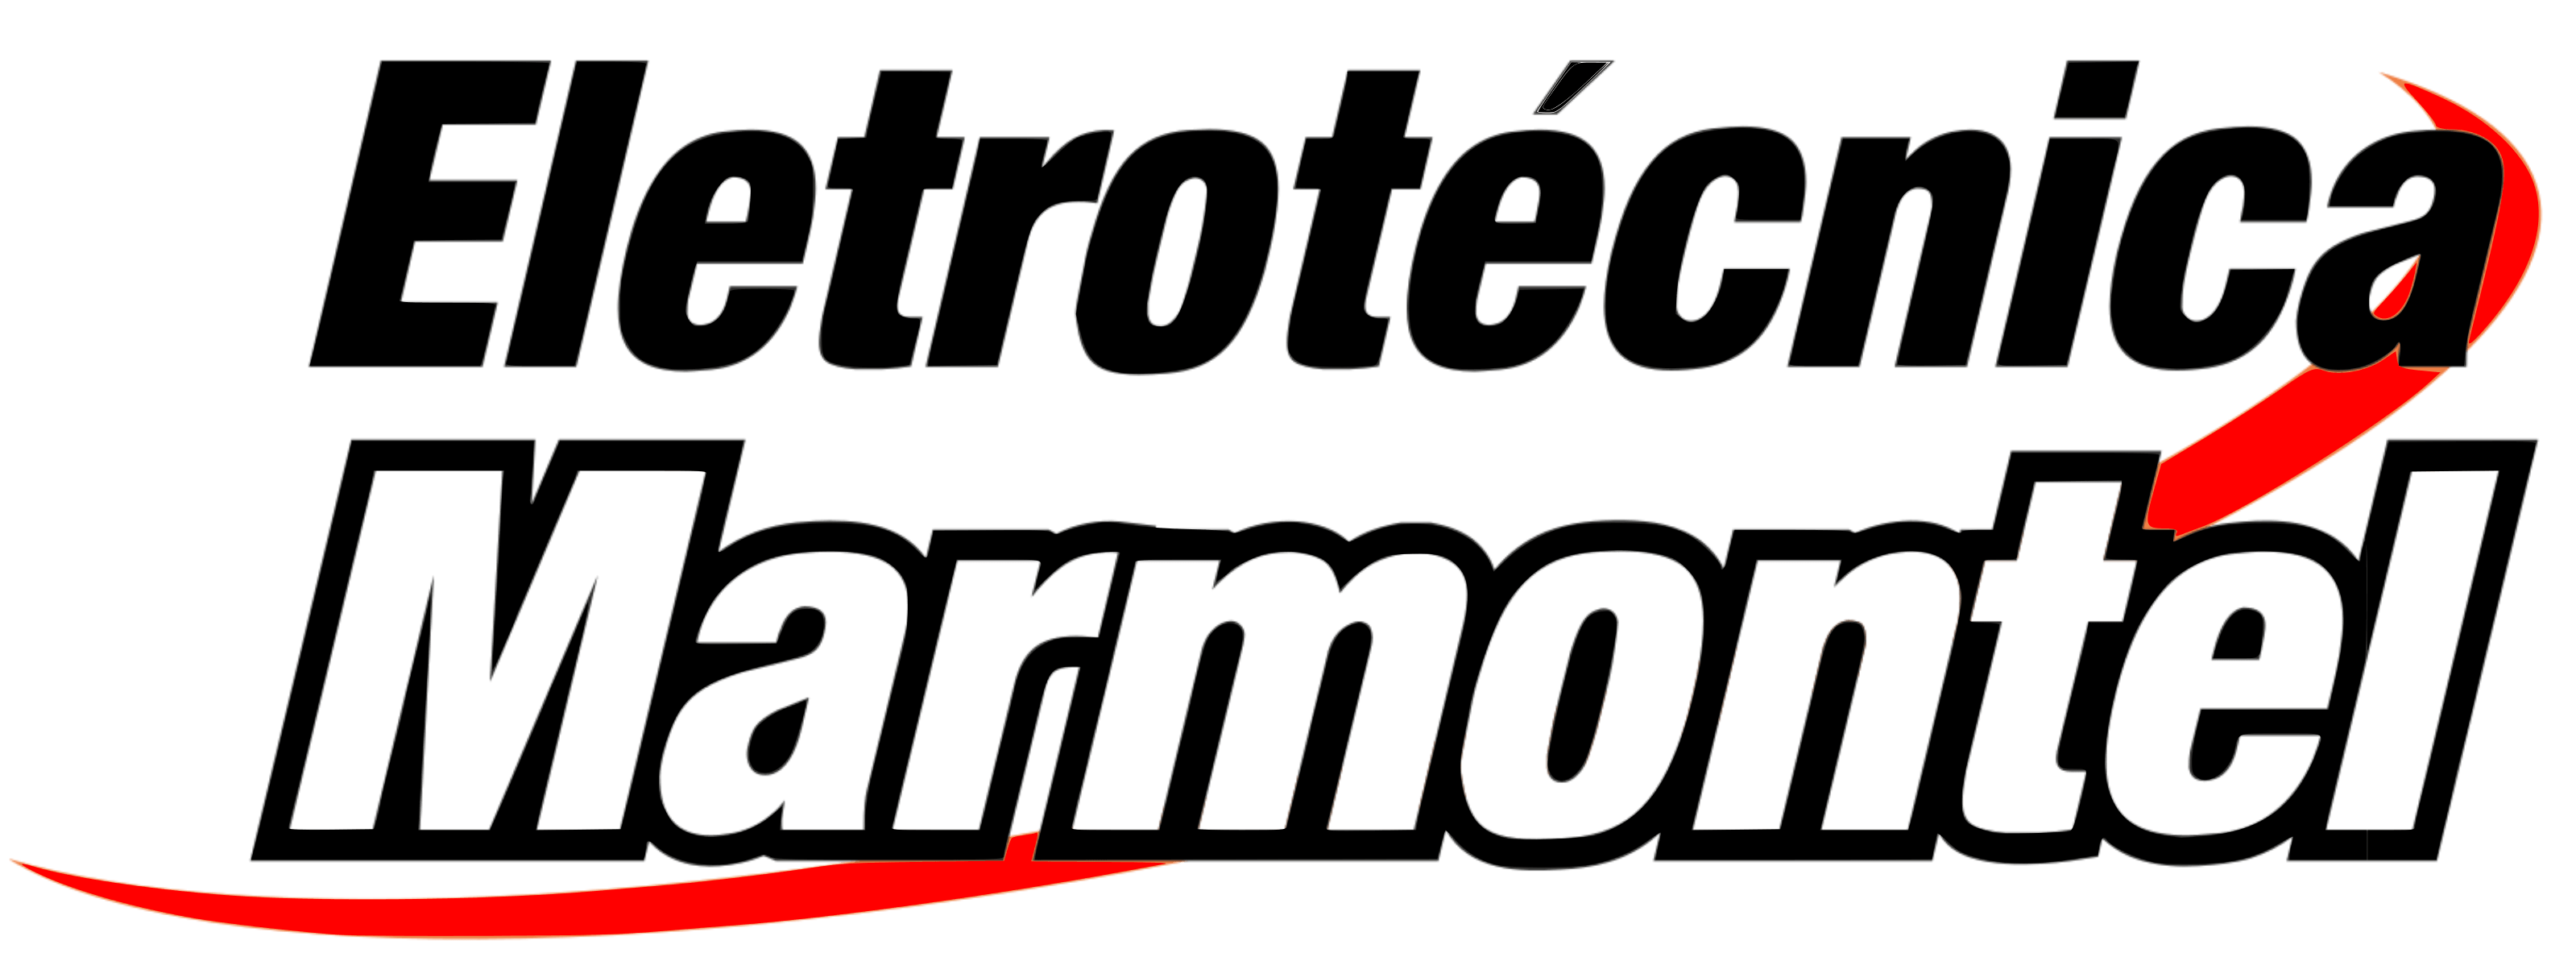 Eletrotécnica Marmontel